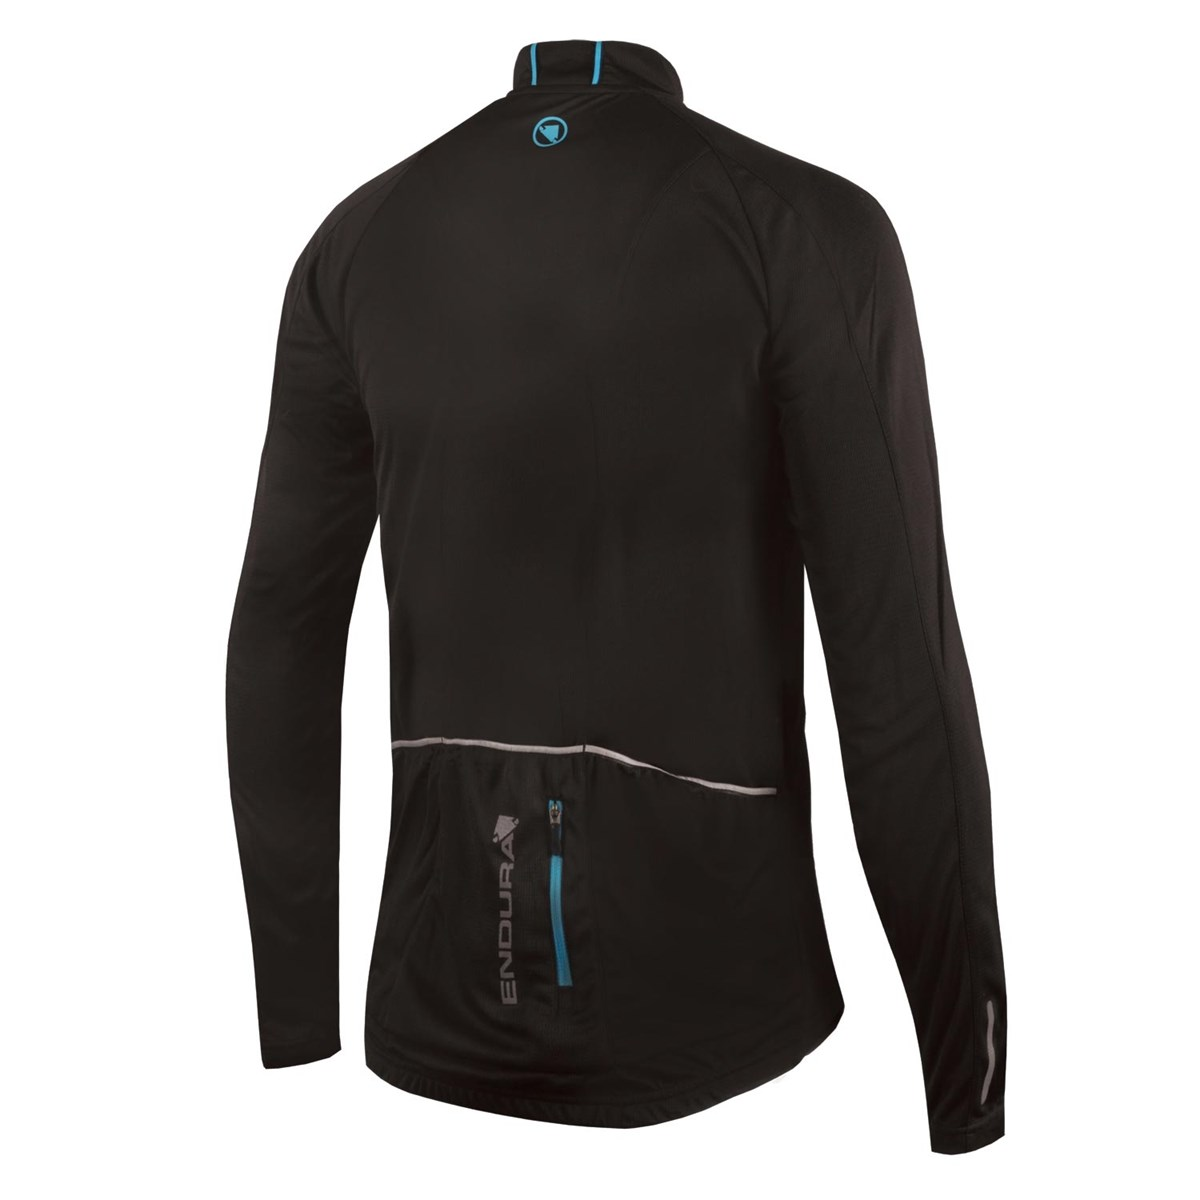 Endura Xtract Long Sleeve Black Cycling Jersey £42.99 09fb91680